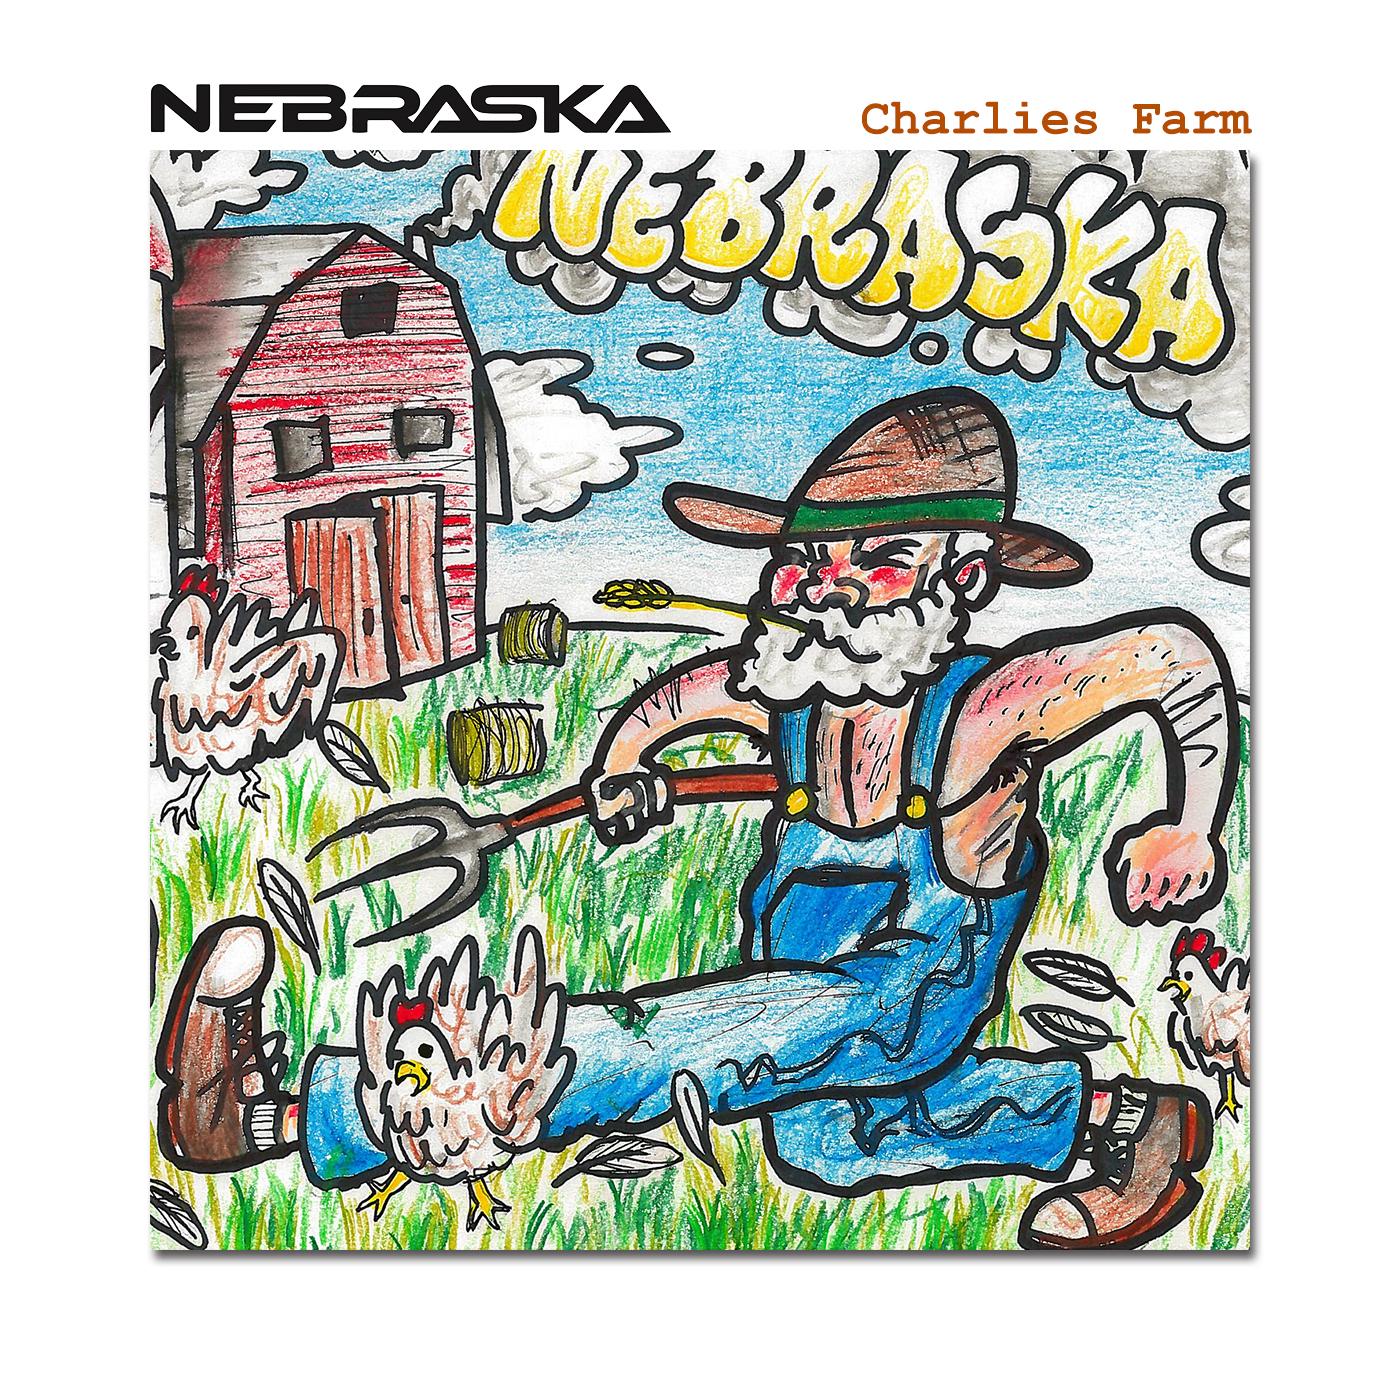 Nebraska – Charlies Farm